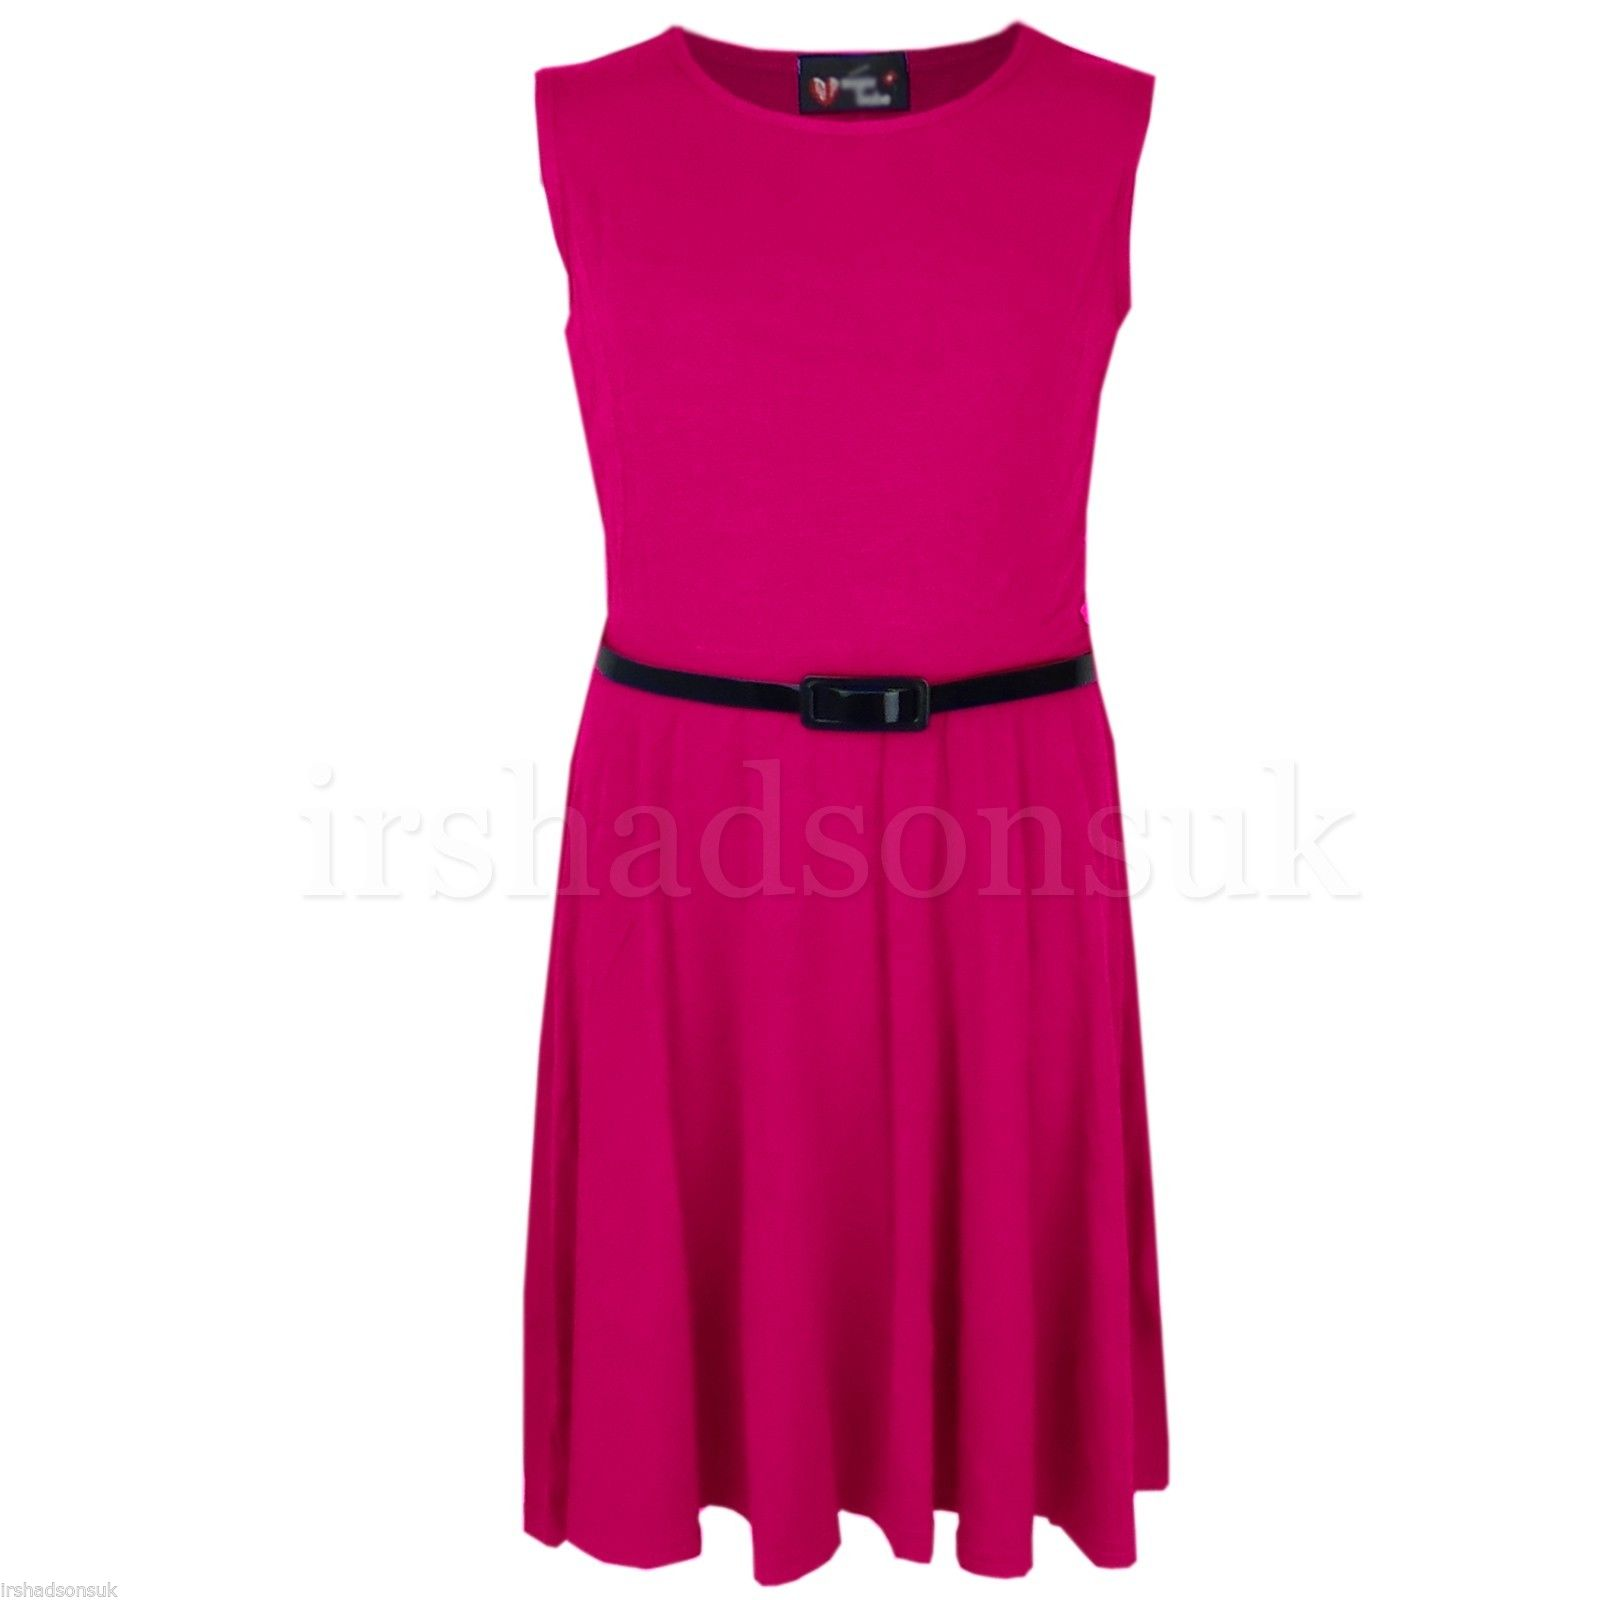 Girls-Skater-Dress-Kids-Neon-Bright-Summer-Party-Dresses-7-8-9-10-11-12-13-Years